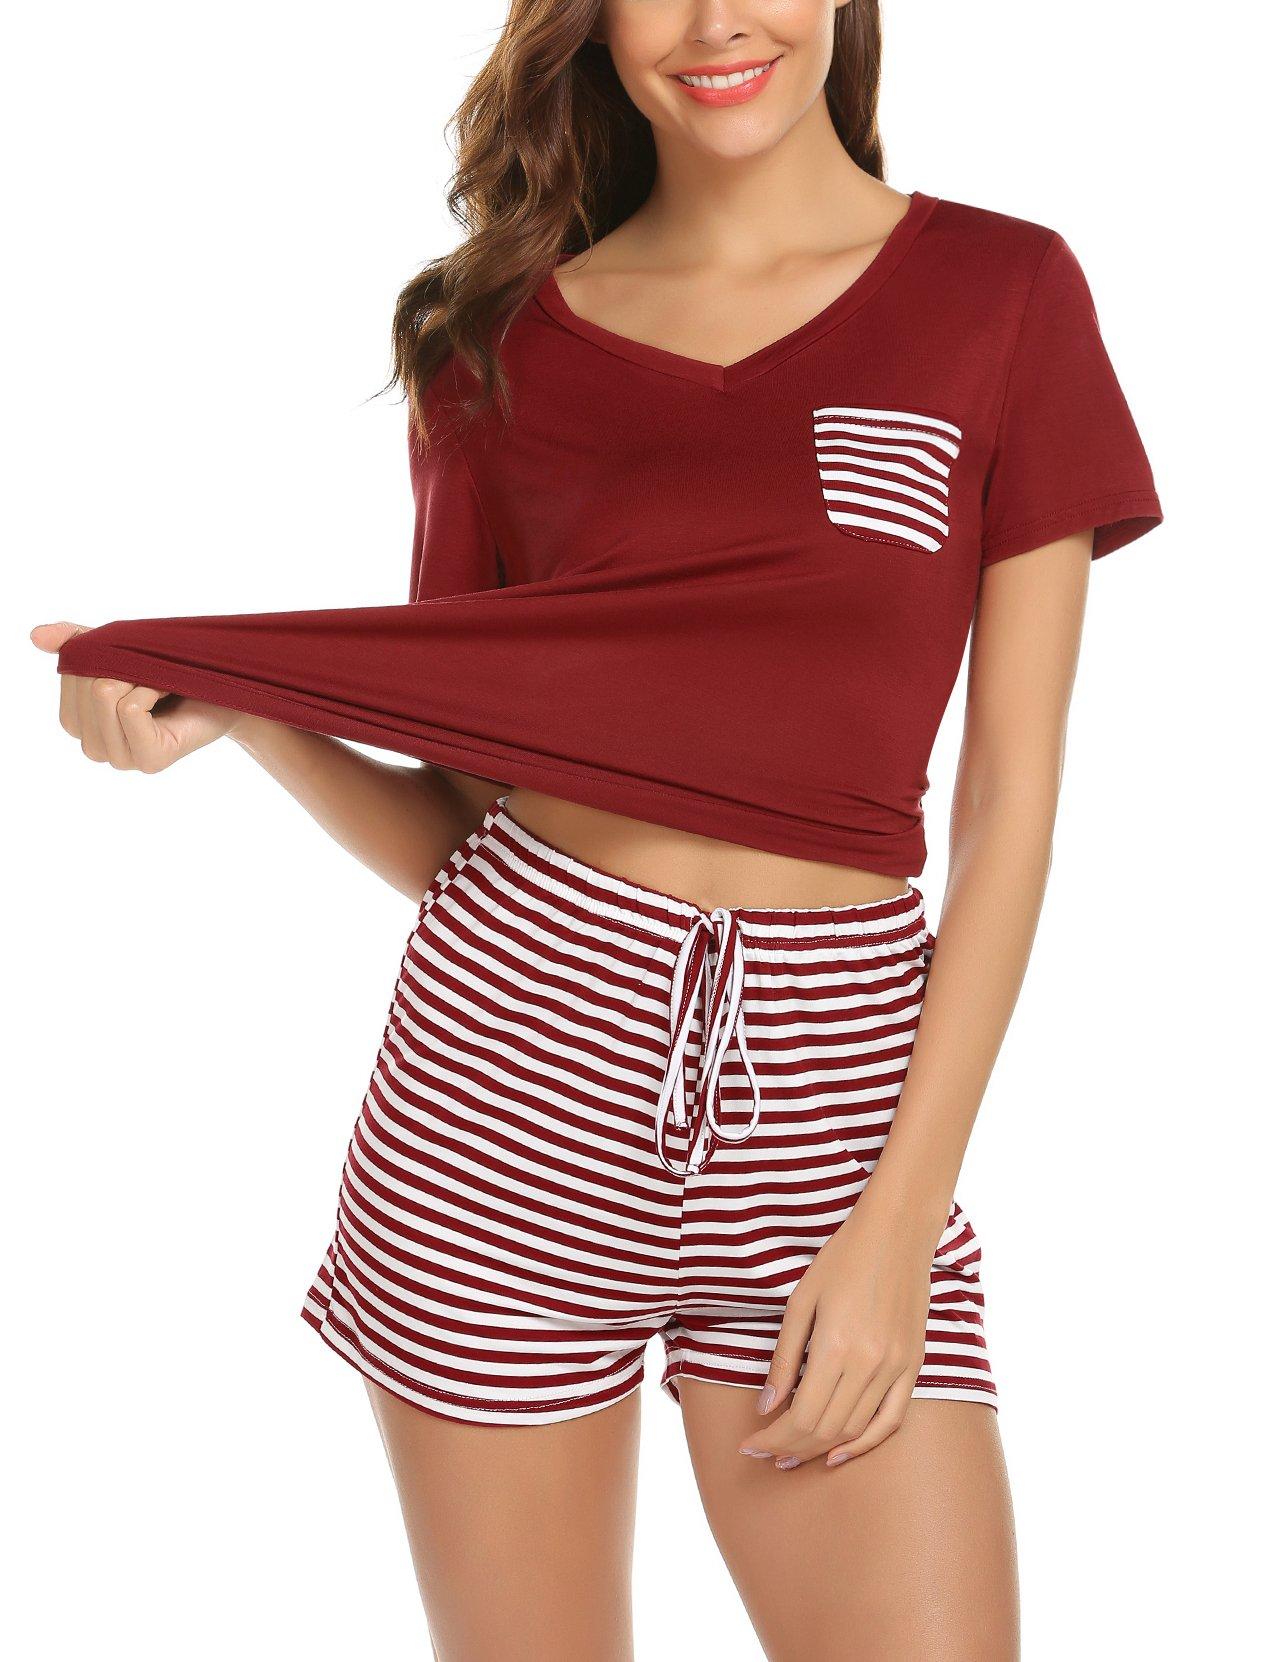 hellow friends Ladies Lightweight Summer Pajamas Soft Short Sleeve Patchwork T-Shirt with Shorts Nightwear for Women S-2XL